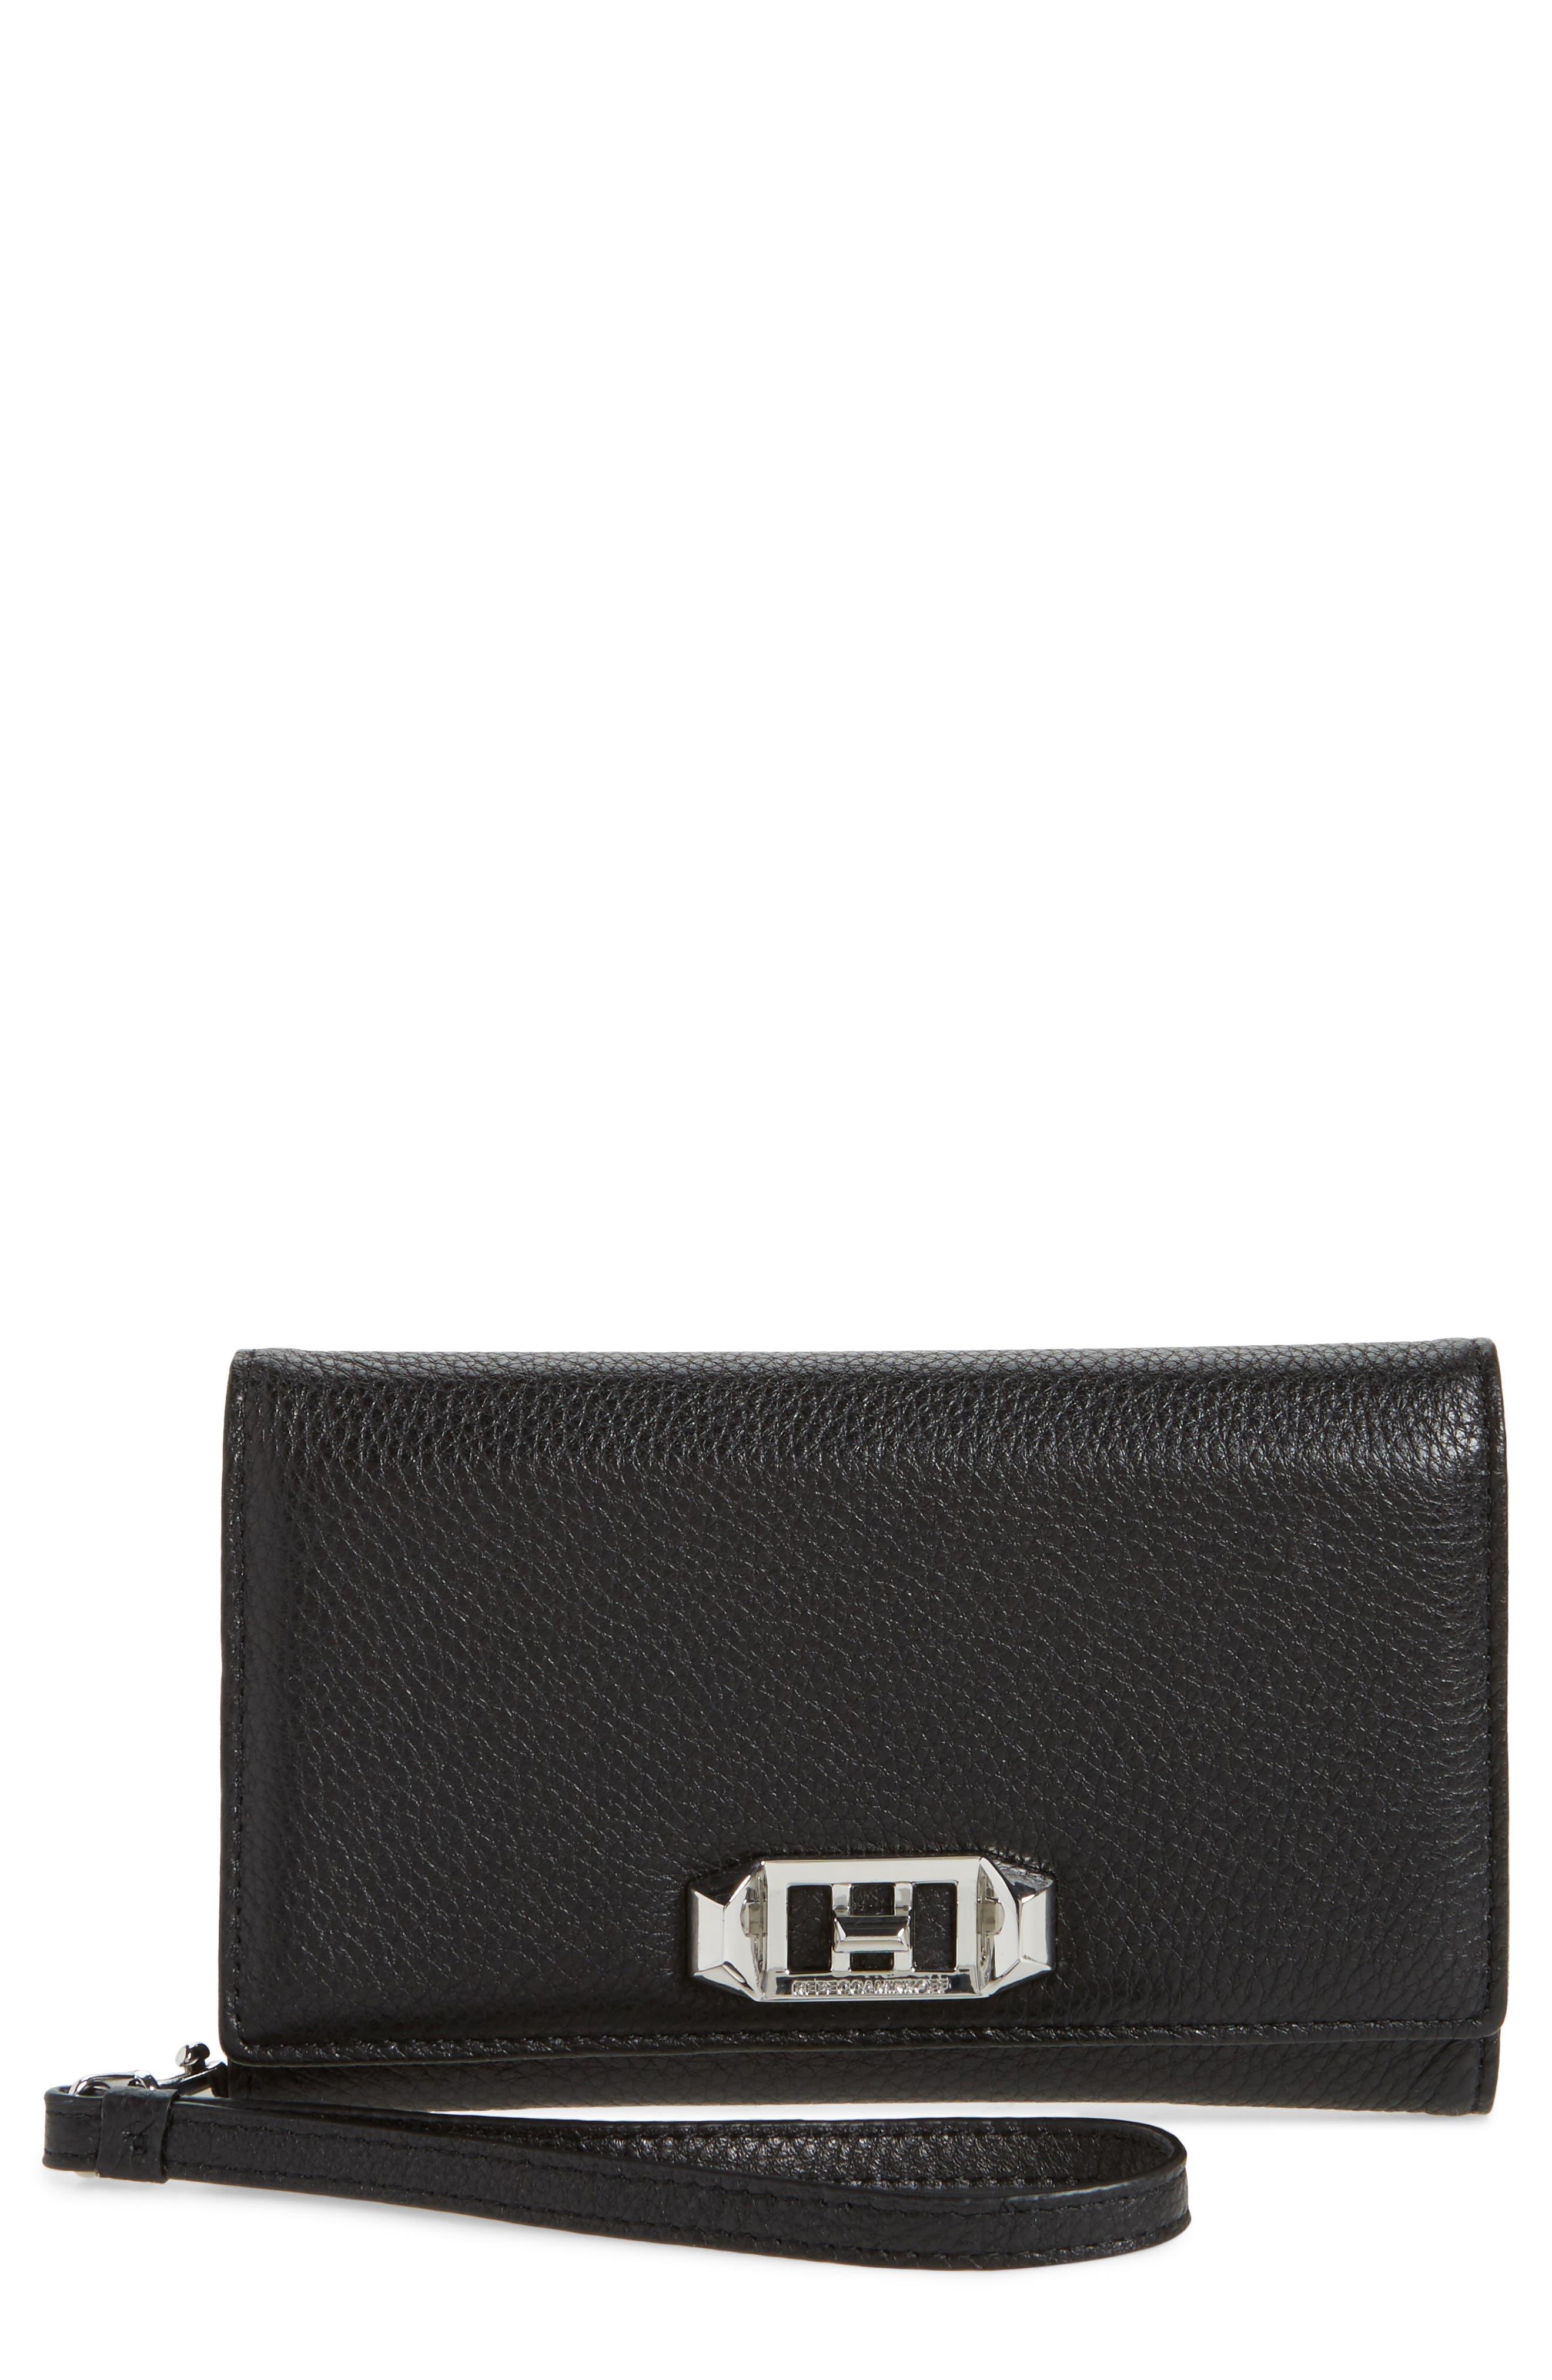 Rebecca Minkoff Love Lock iPhone 7/8 & 7/8 Plus Leather Wristlet Folio